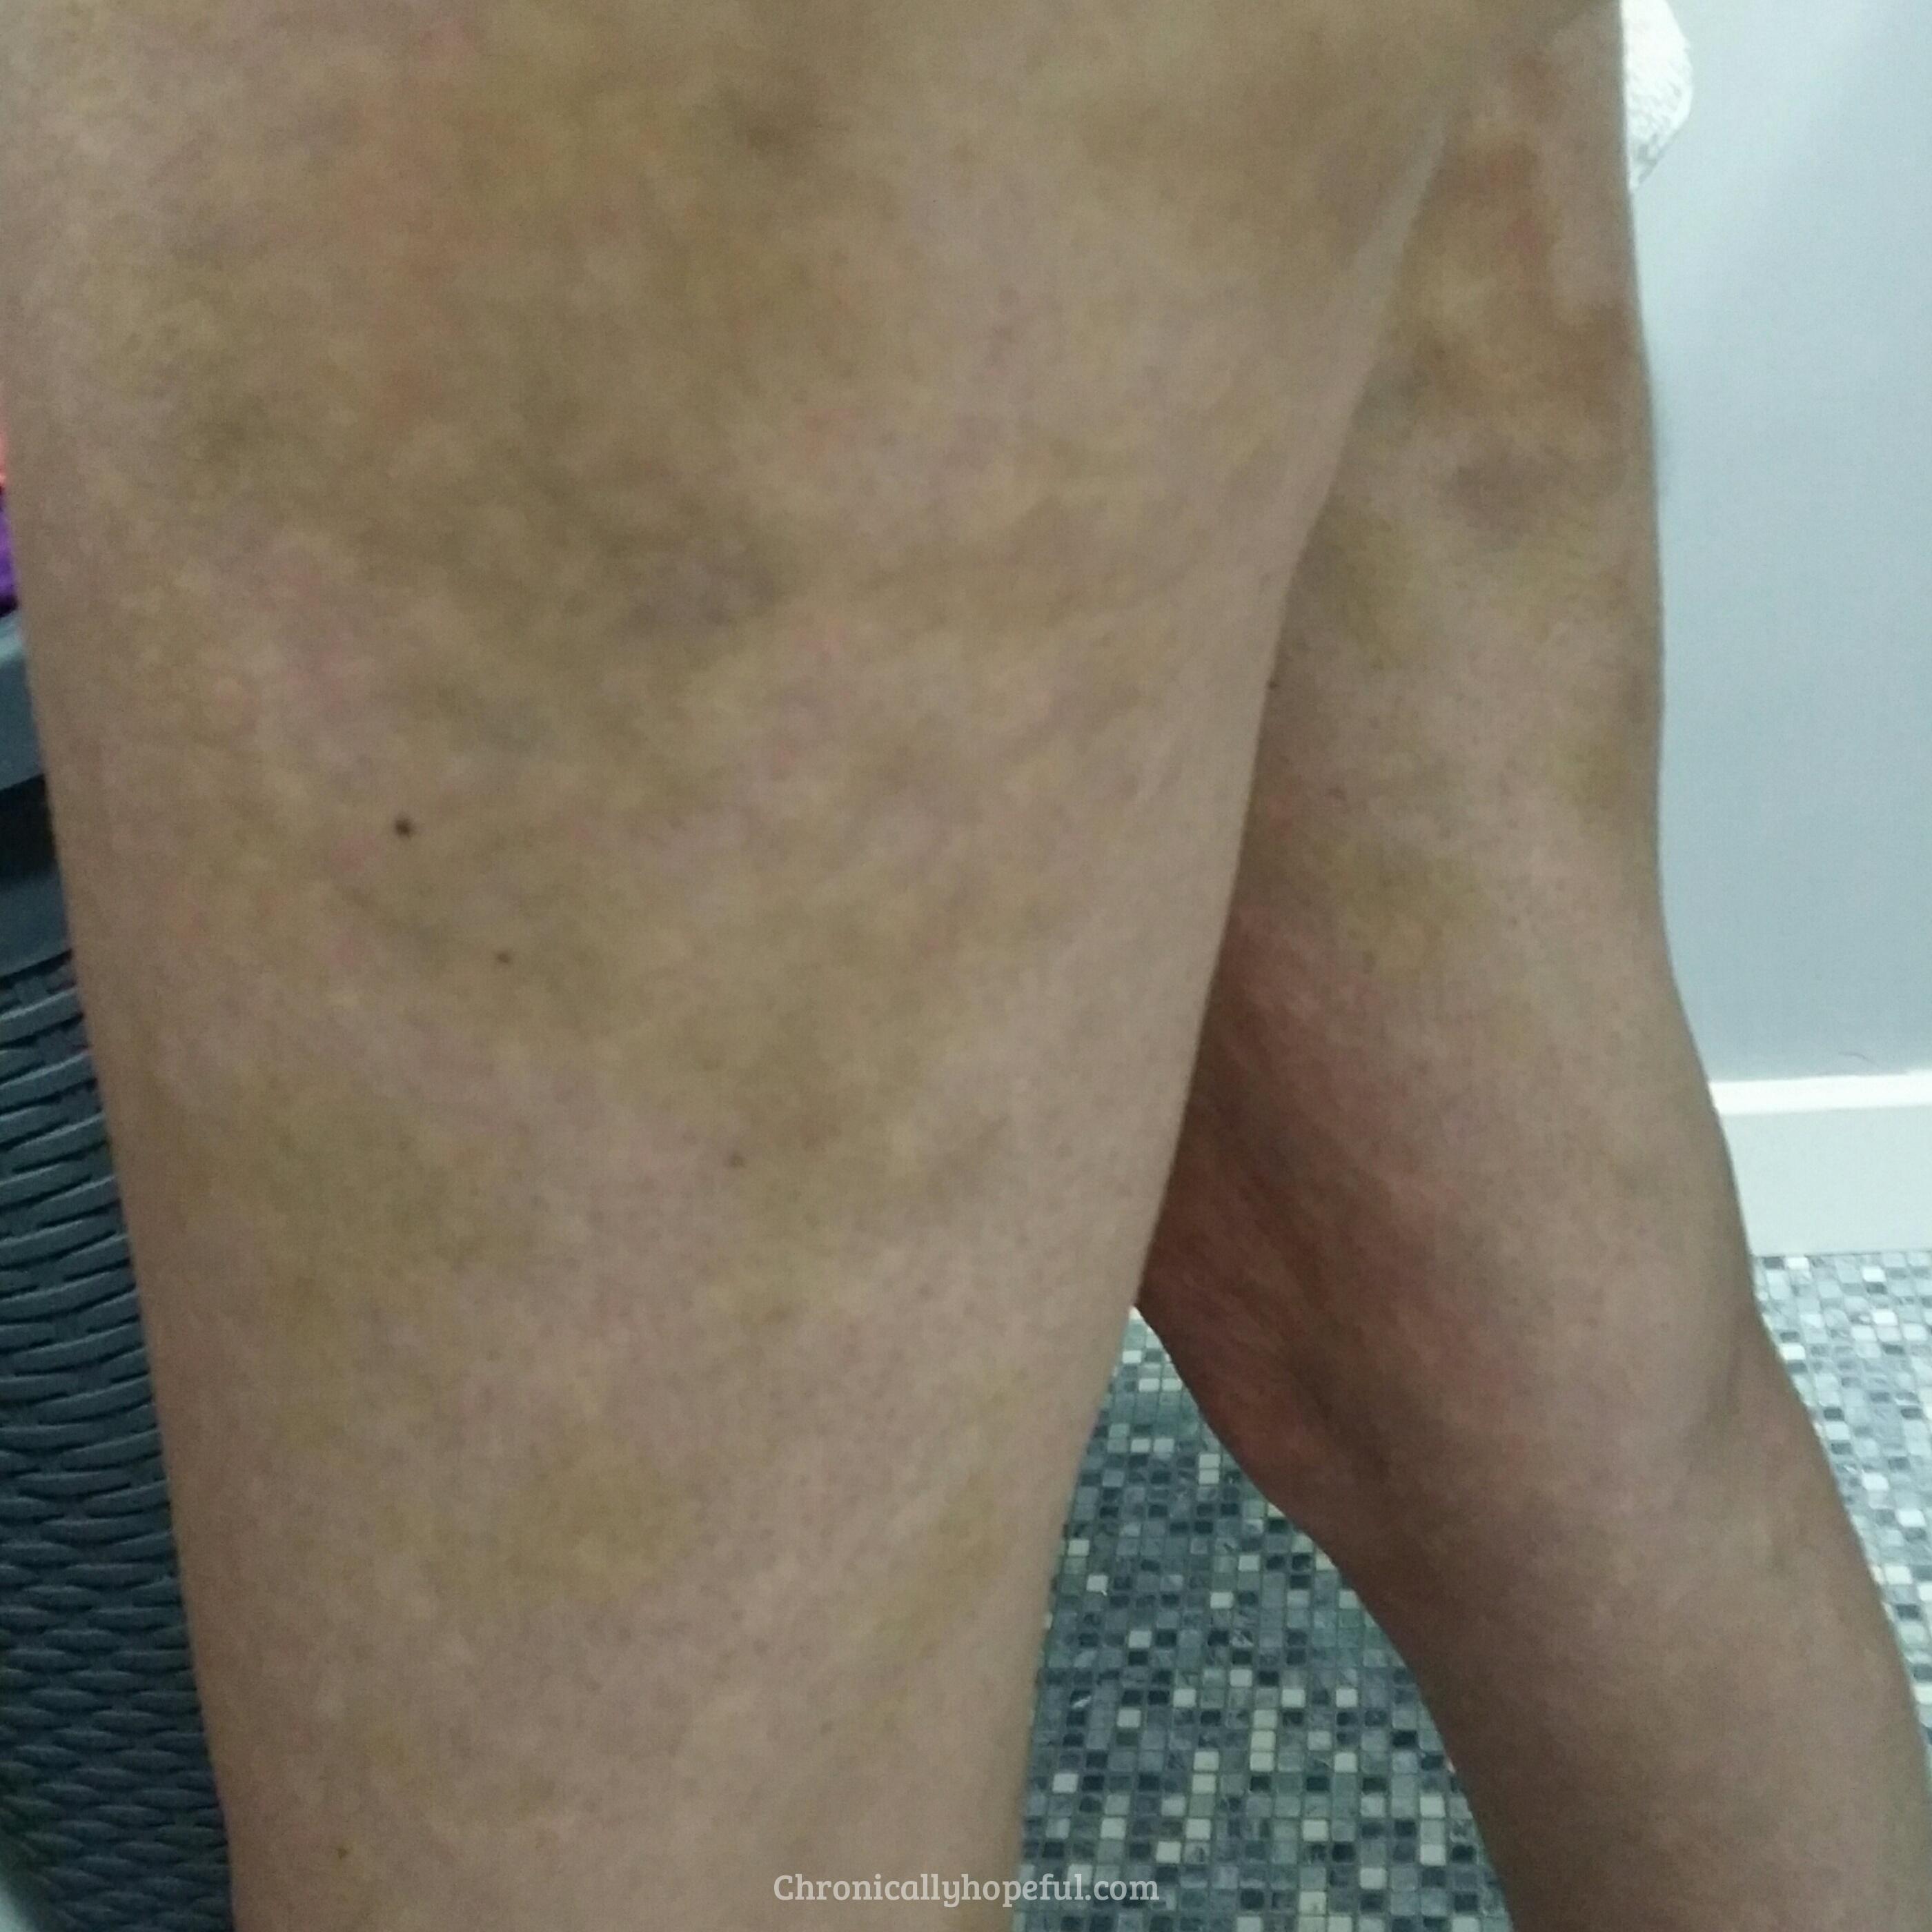 Bruising On My Legs, Histamine Intolerance, Chronically Hopeful